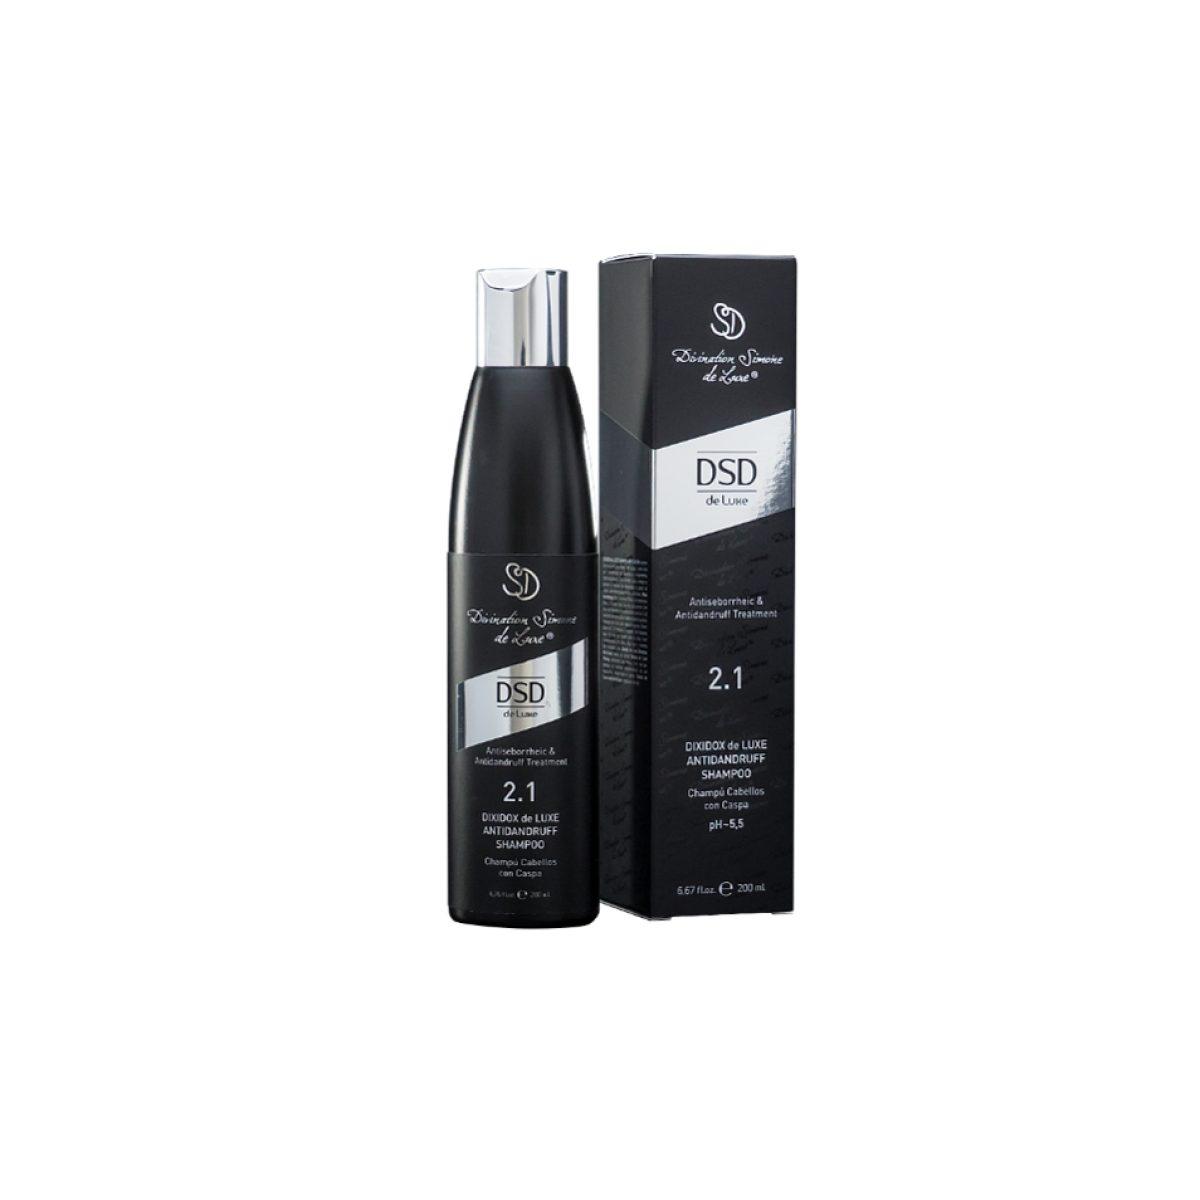 DSD De Luxe 2.1 Dixidox de Luxe Anti-Dandruff Shampoo